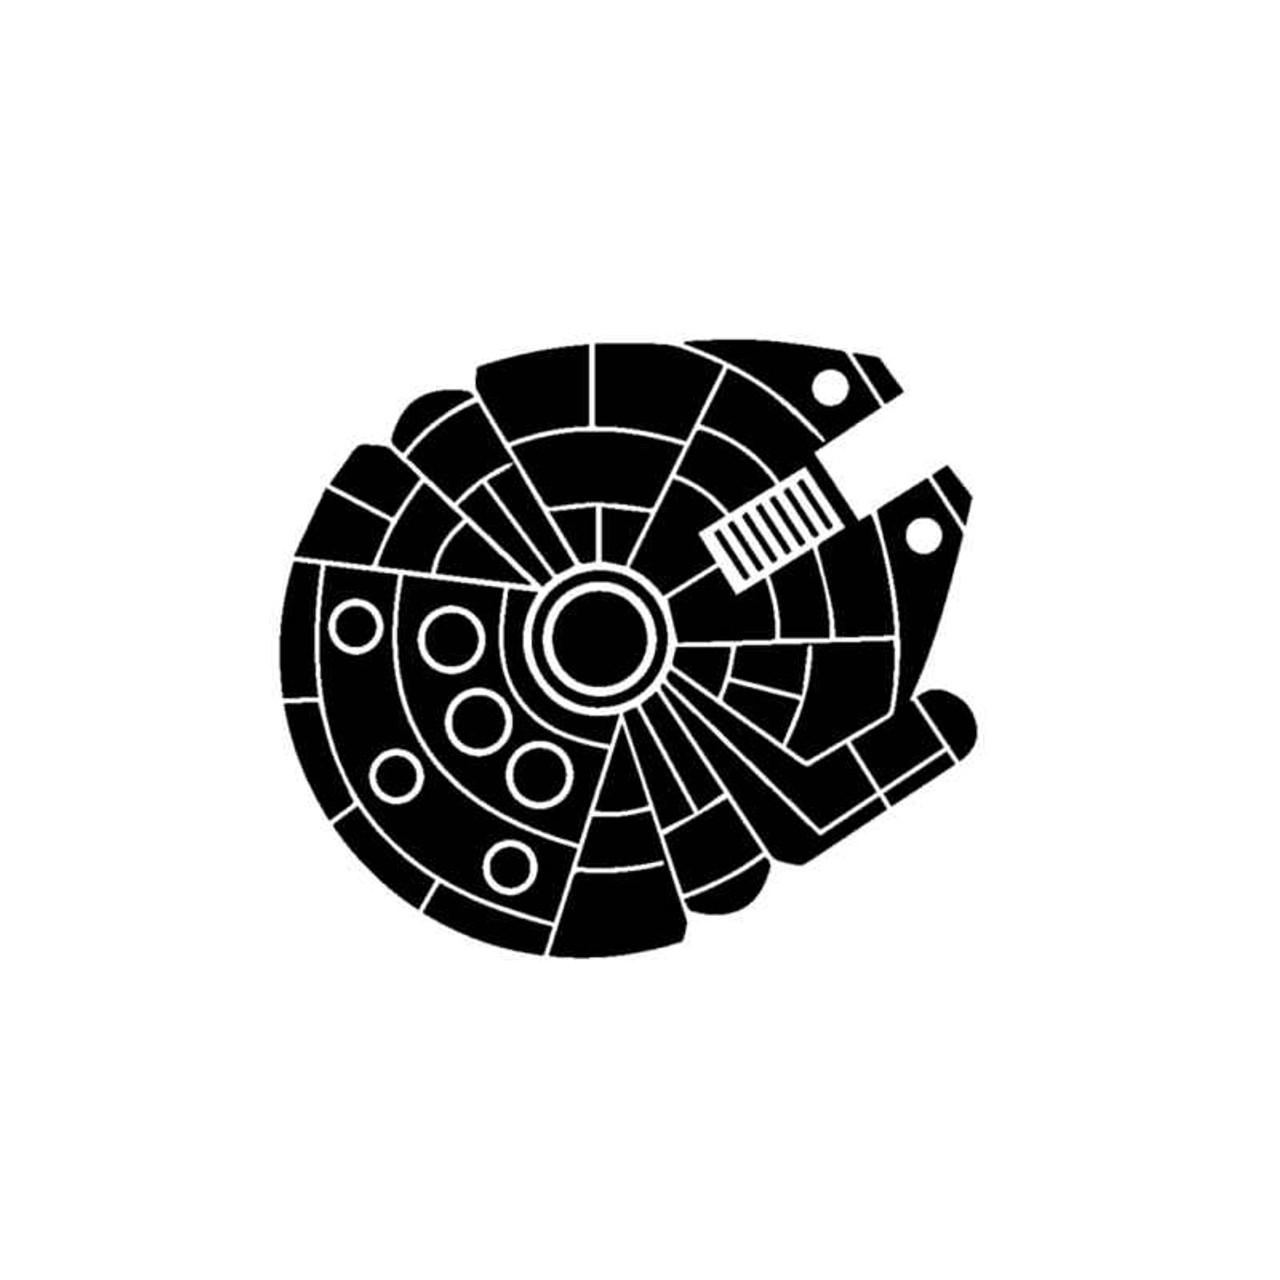 "6/"" Star Wars Milenium Falcon Decal Vinyl Sticker"